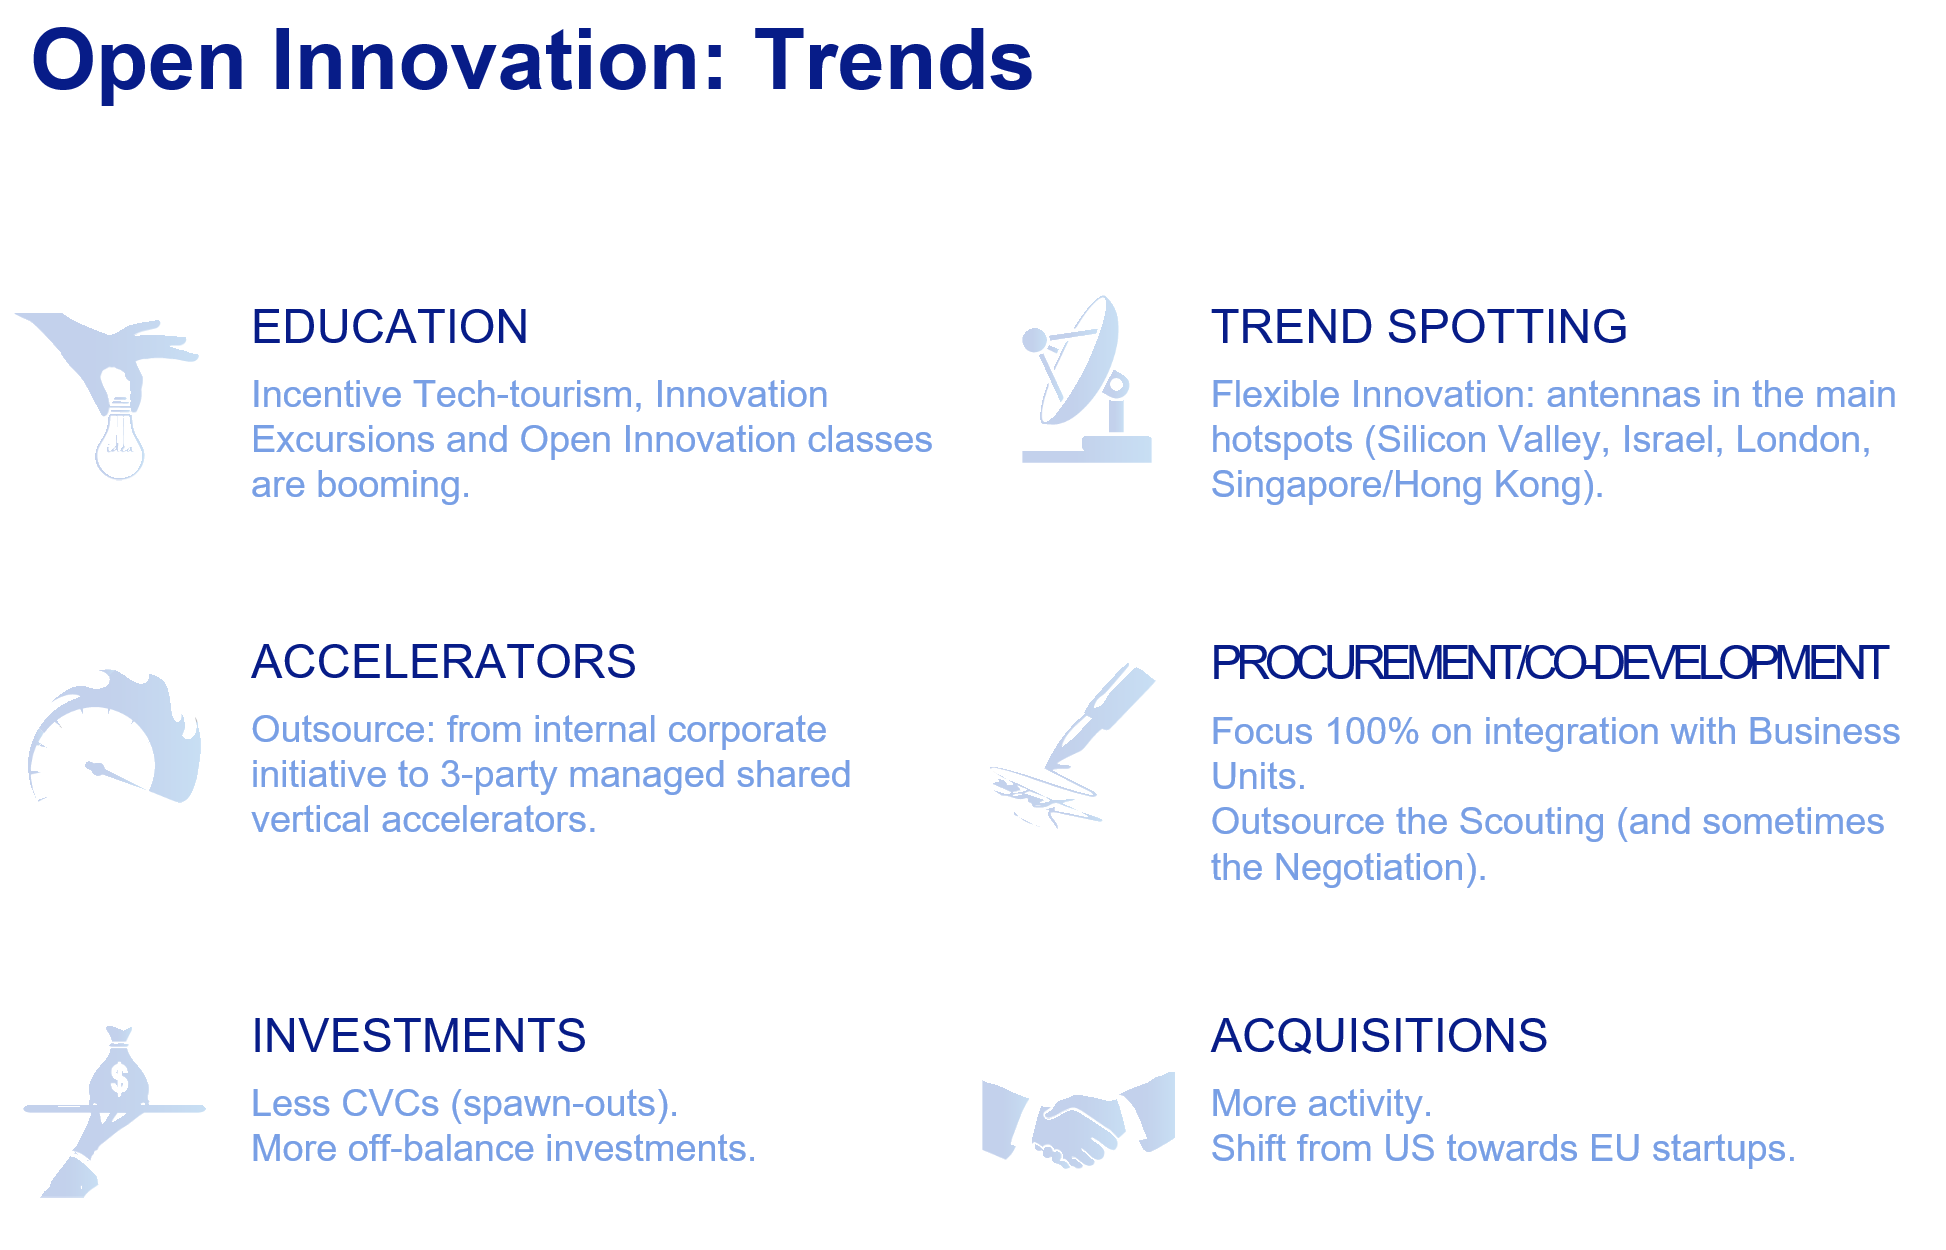 Open Innovation Trends